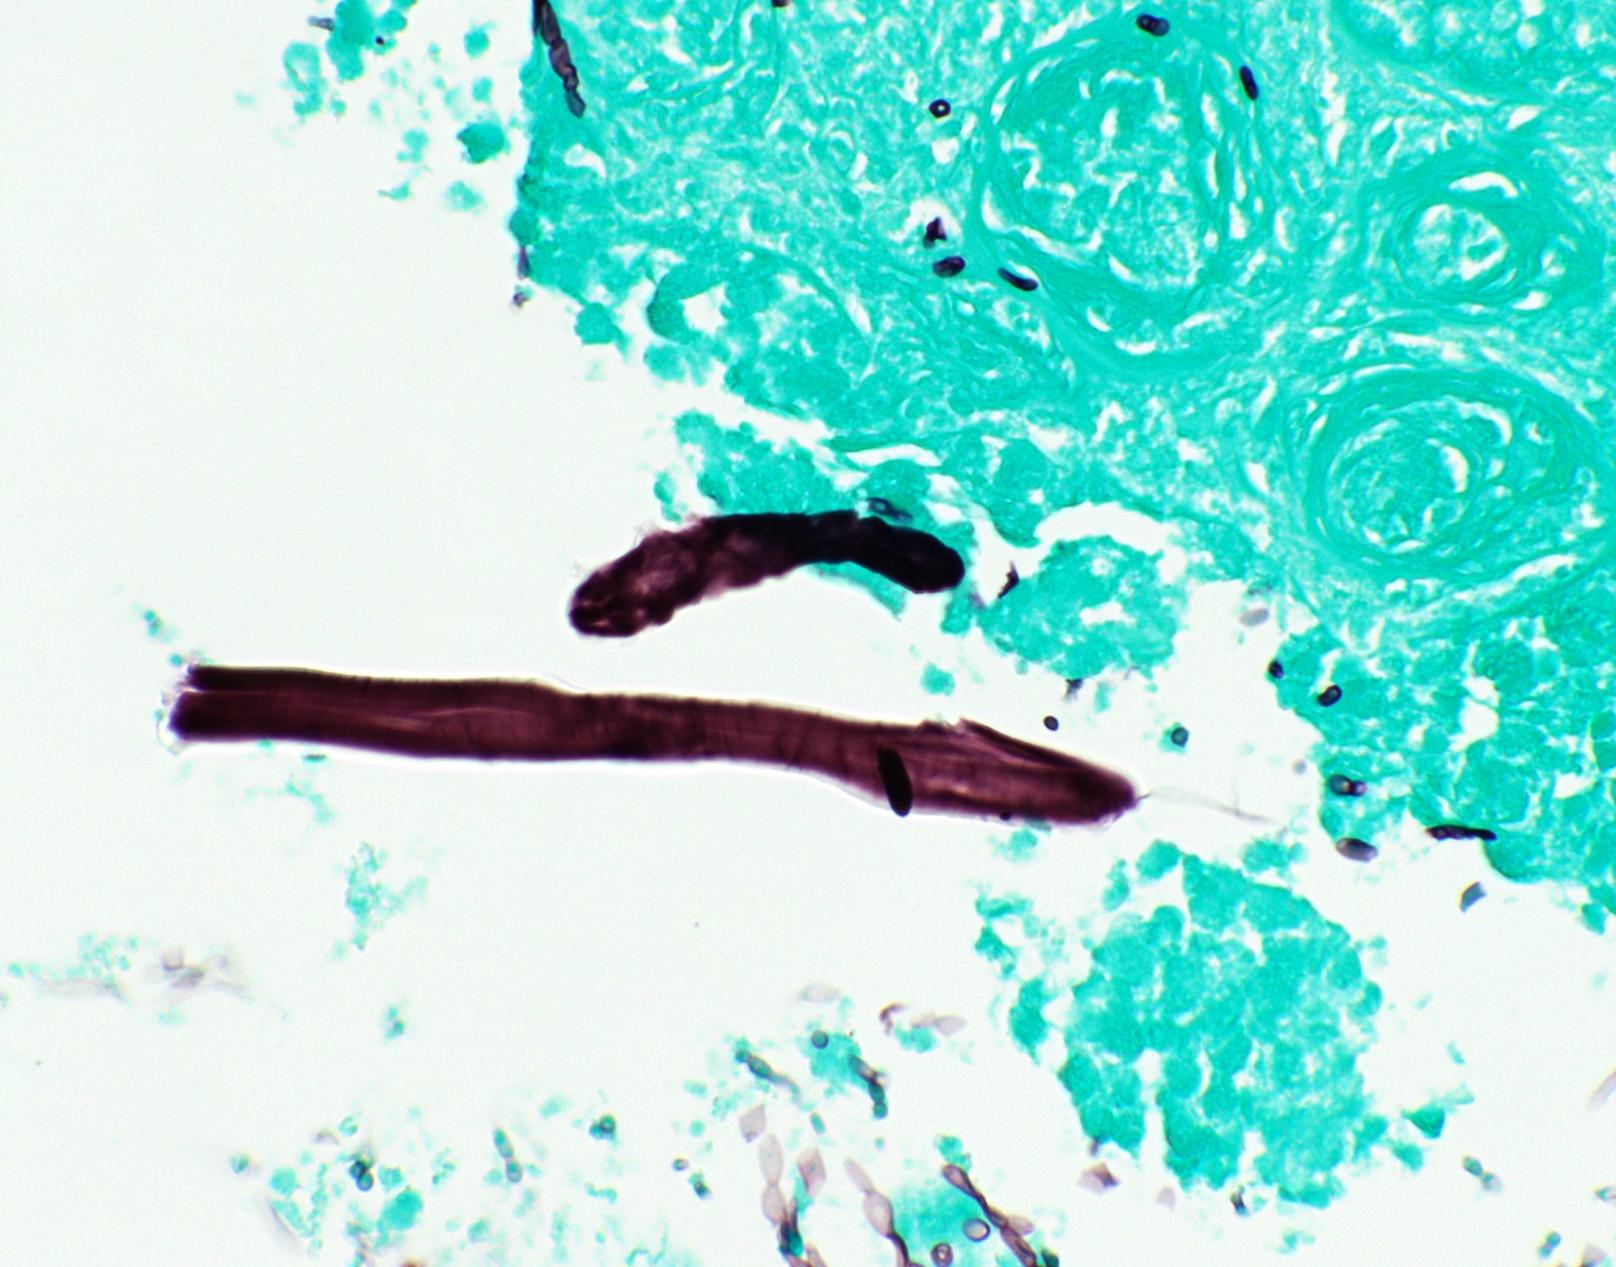 Foreign bodies near fungus